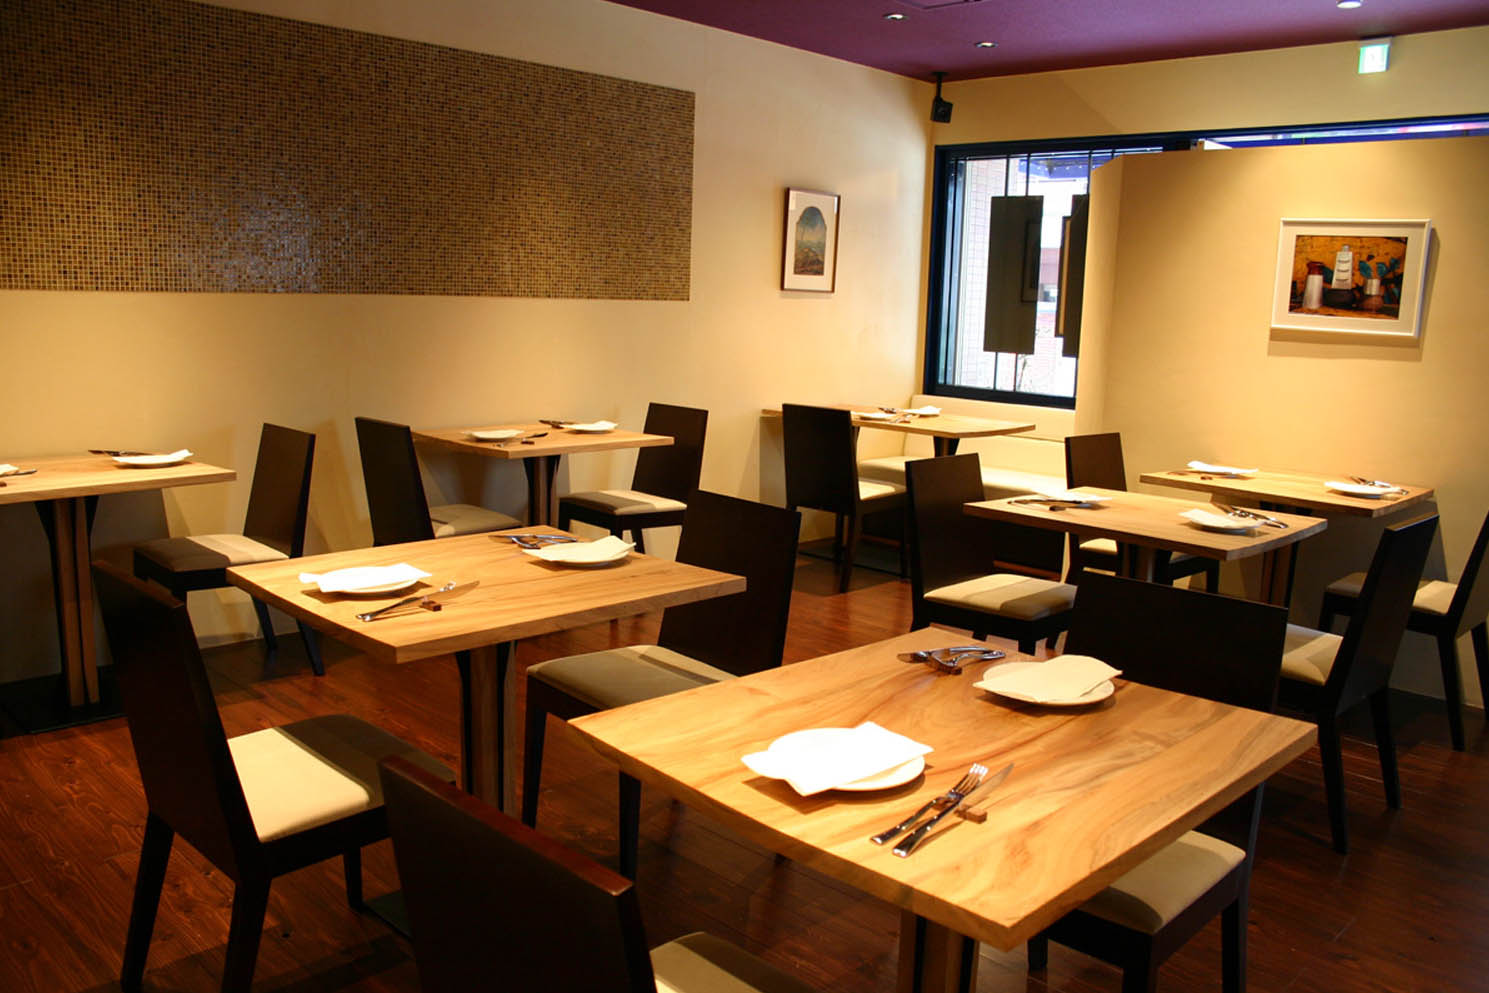 La Base  ラ バーズ フランスの食堂_f0171785_1735241.jpg